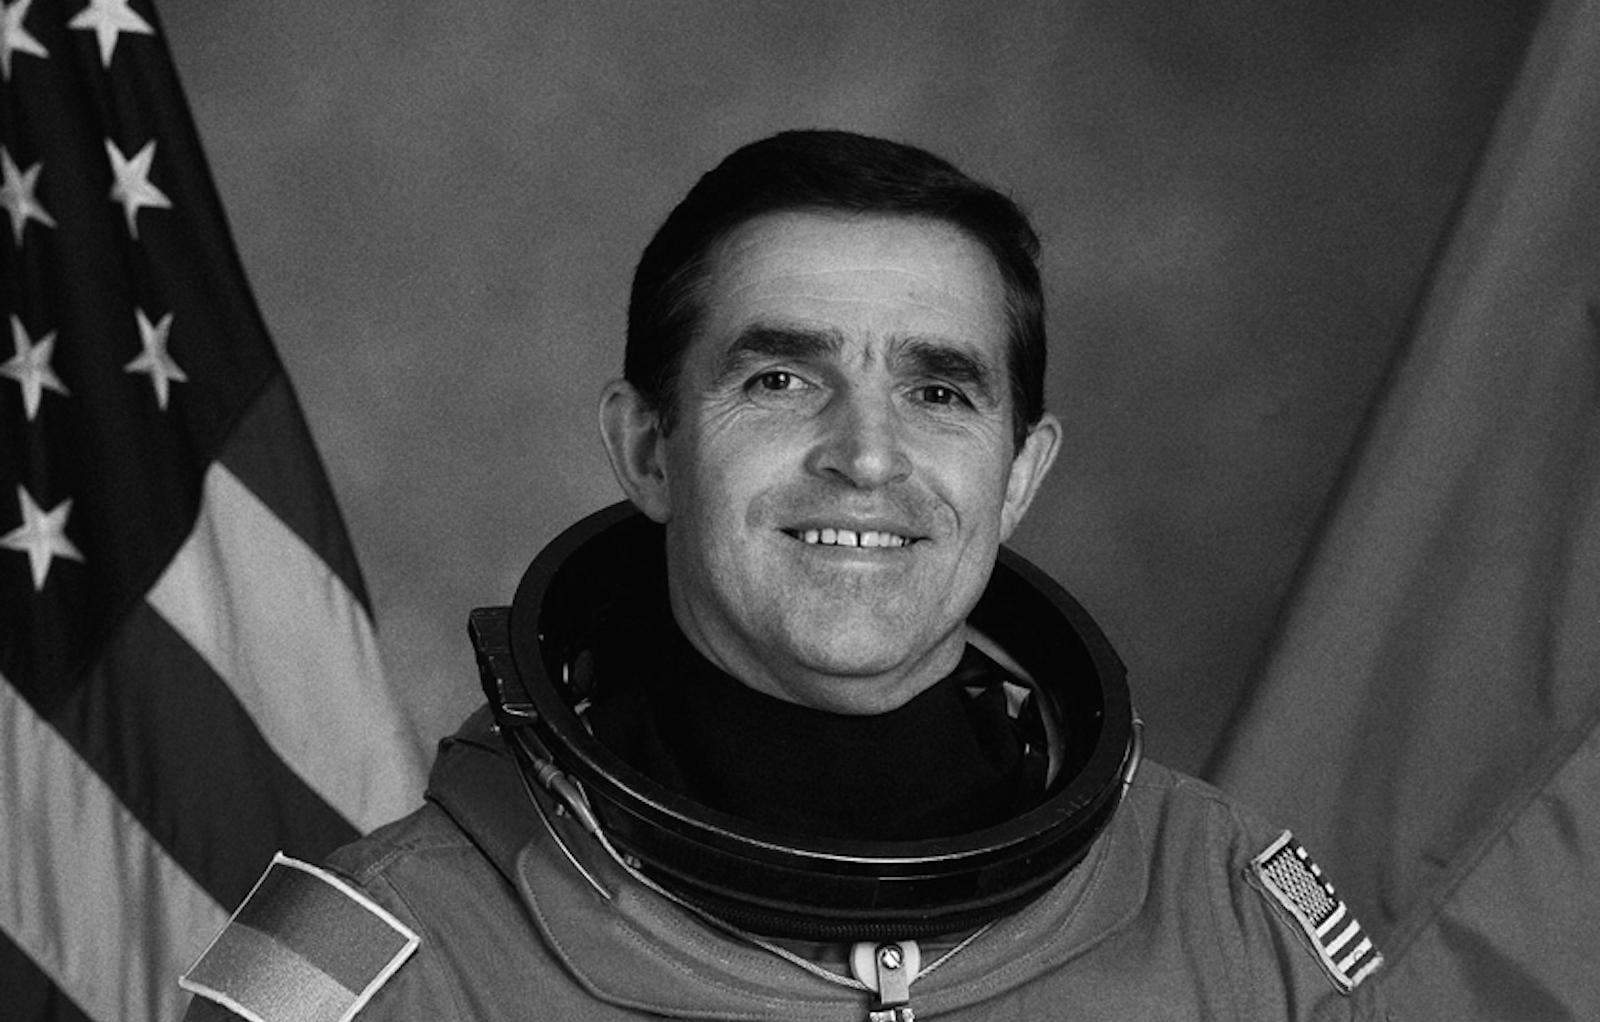 🚀 Kadenjuk: 5 momentiv žyttja peršogo kosmonavta Ukraїny